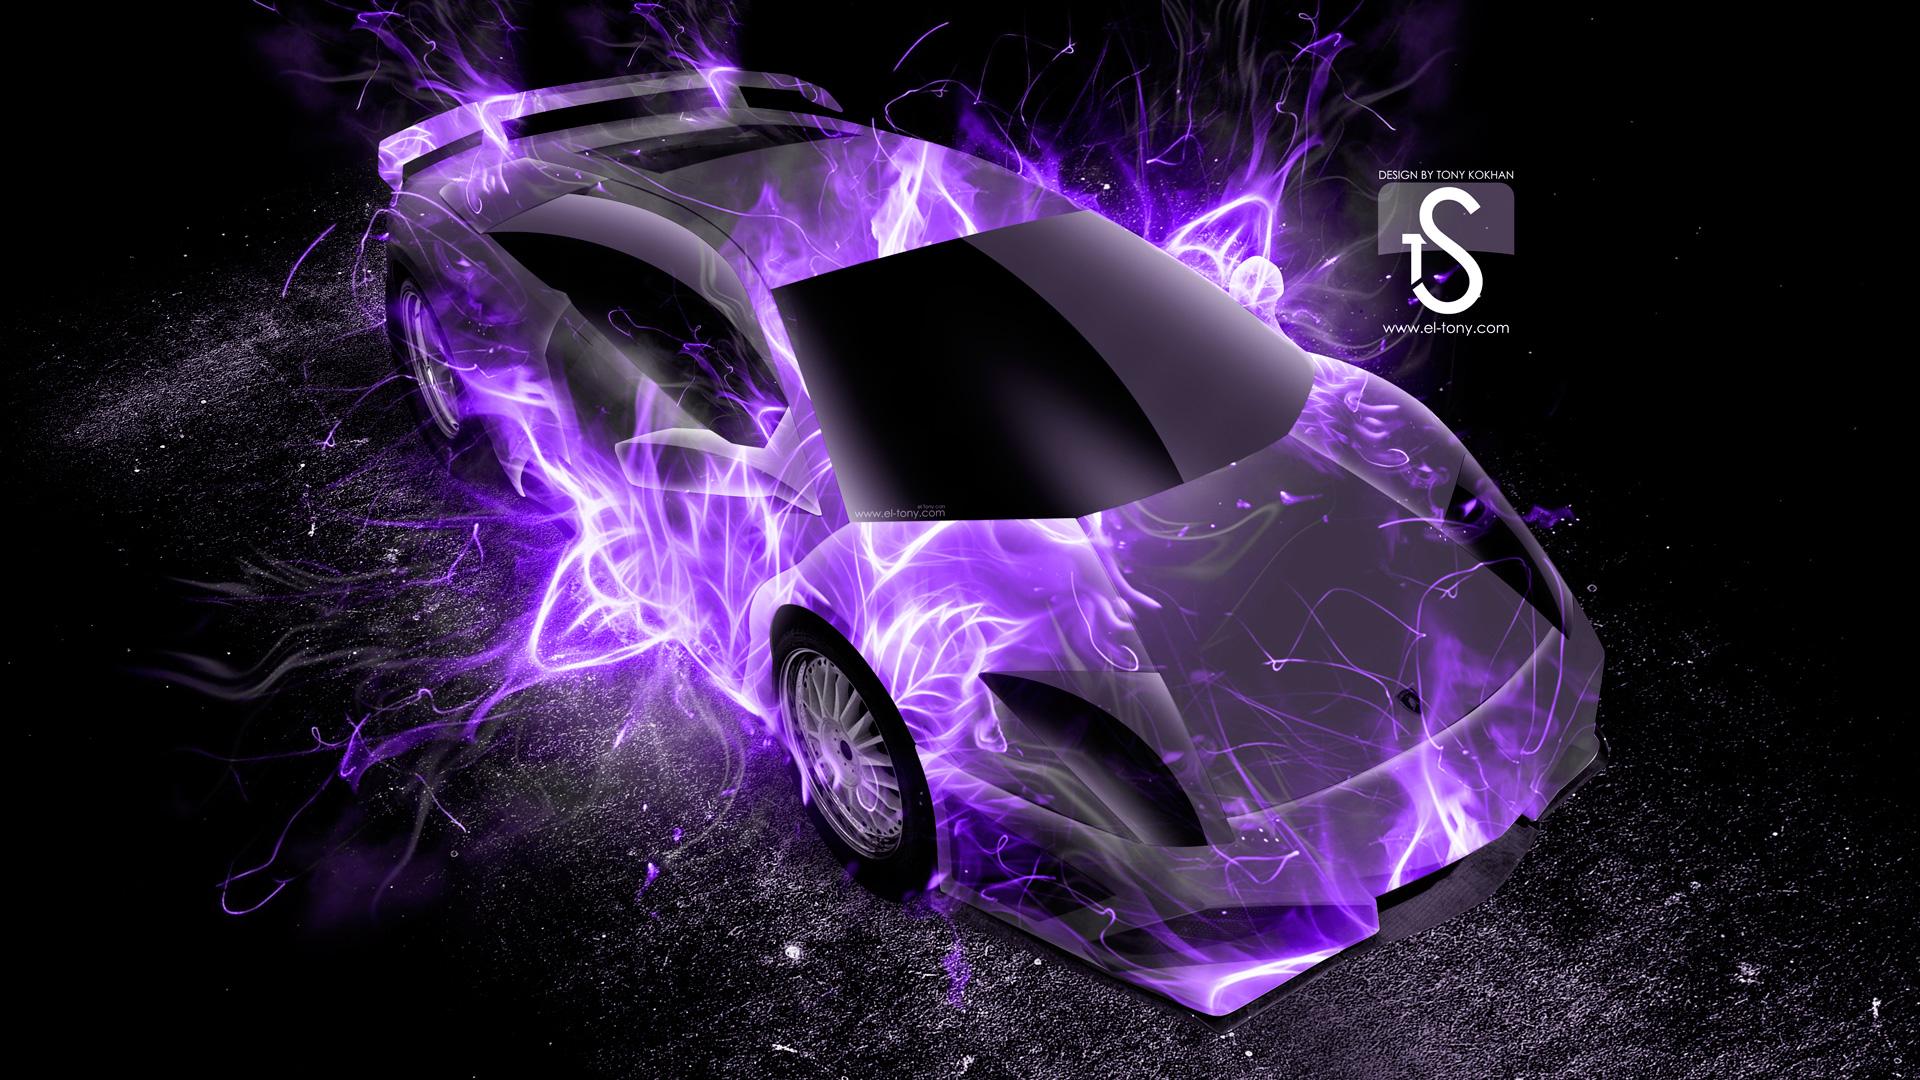 Lamborghini Murcielago Up Violet Fire Abstract Car 2013 HD ...